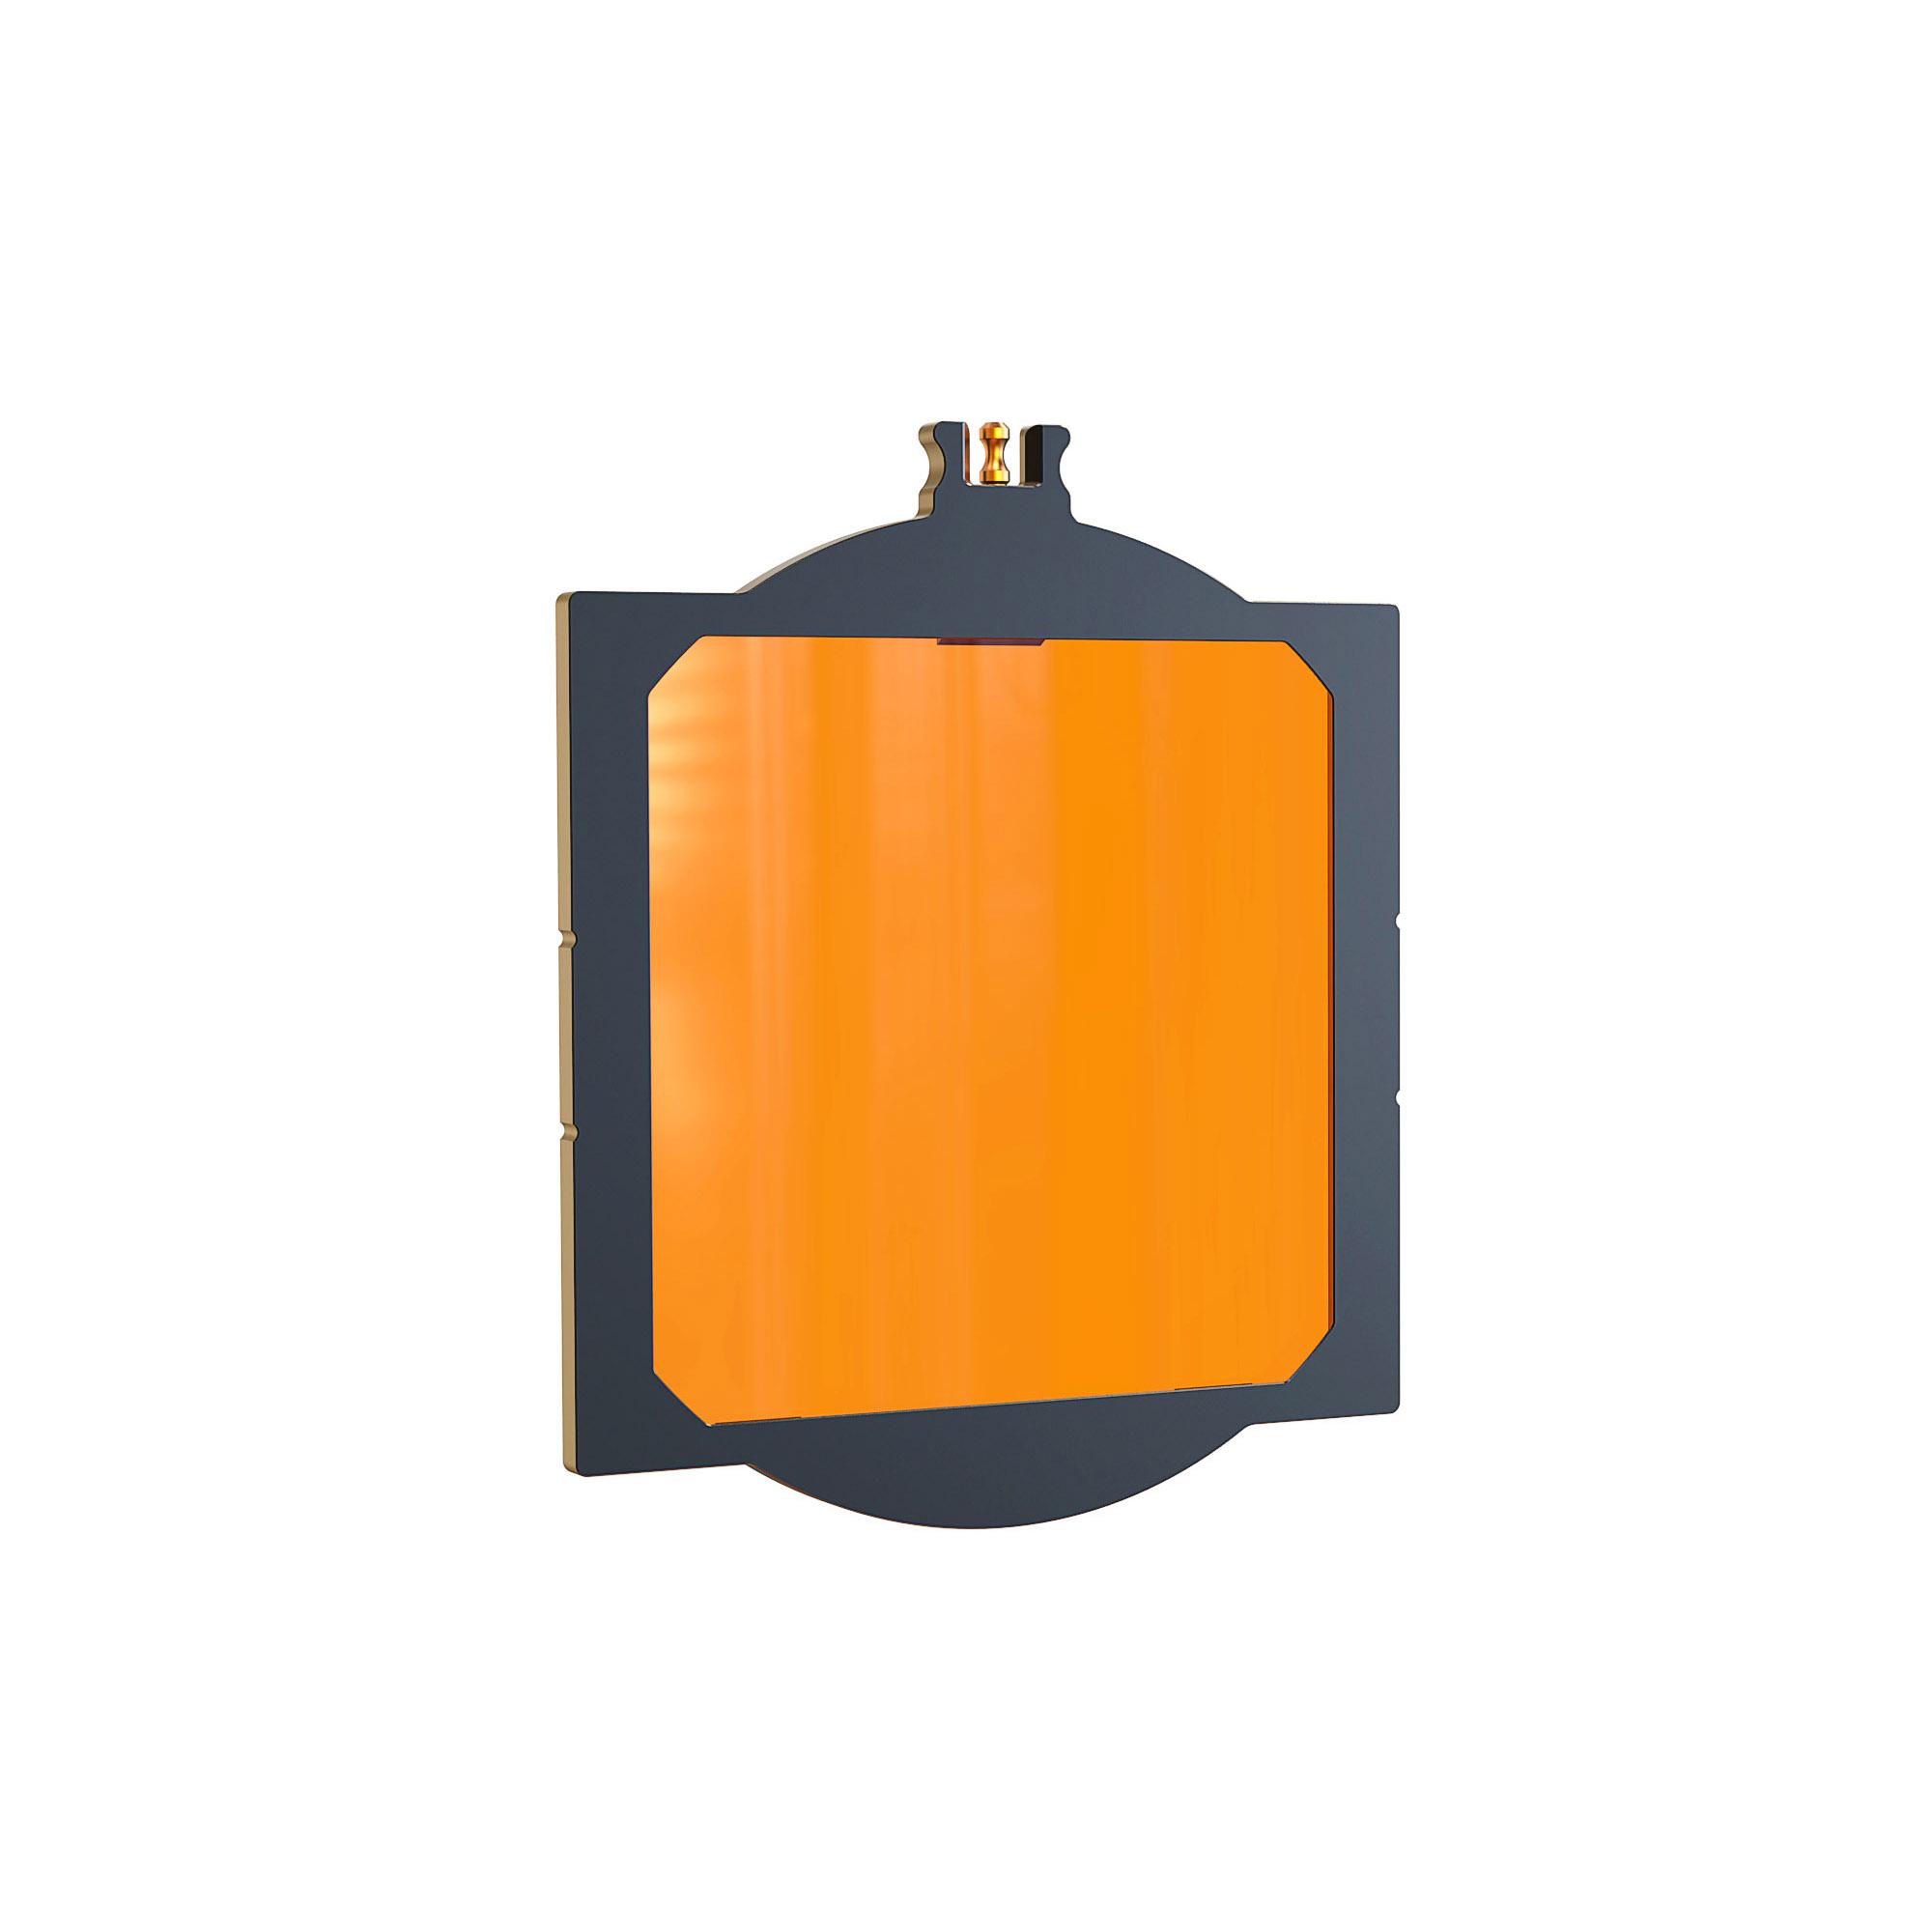 b1251.1014   viv 5   5x5   filter tray   1